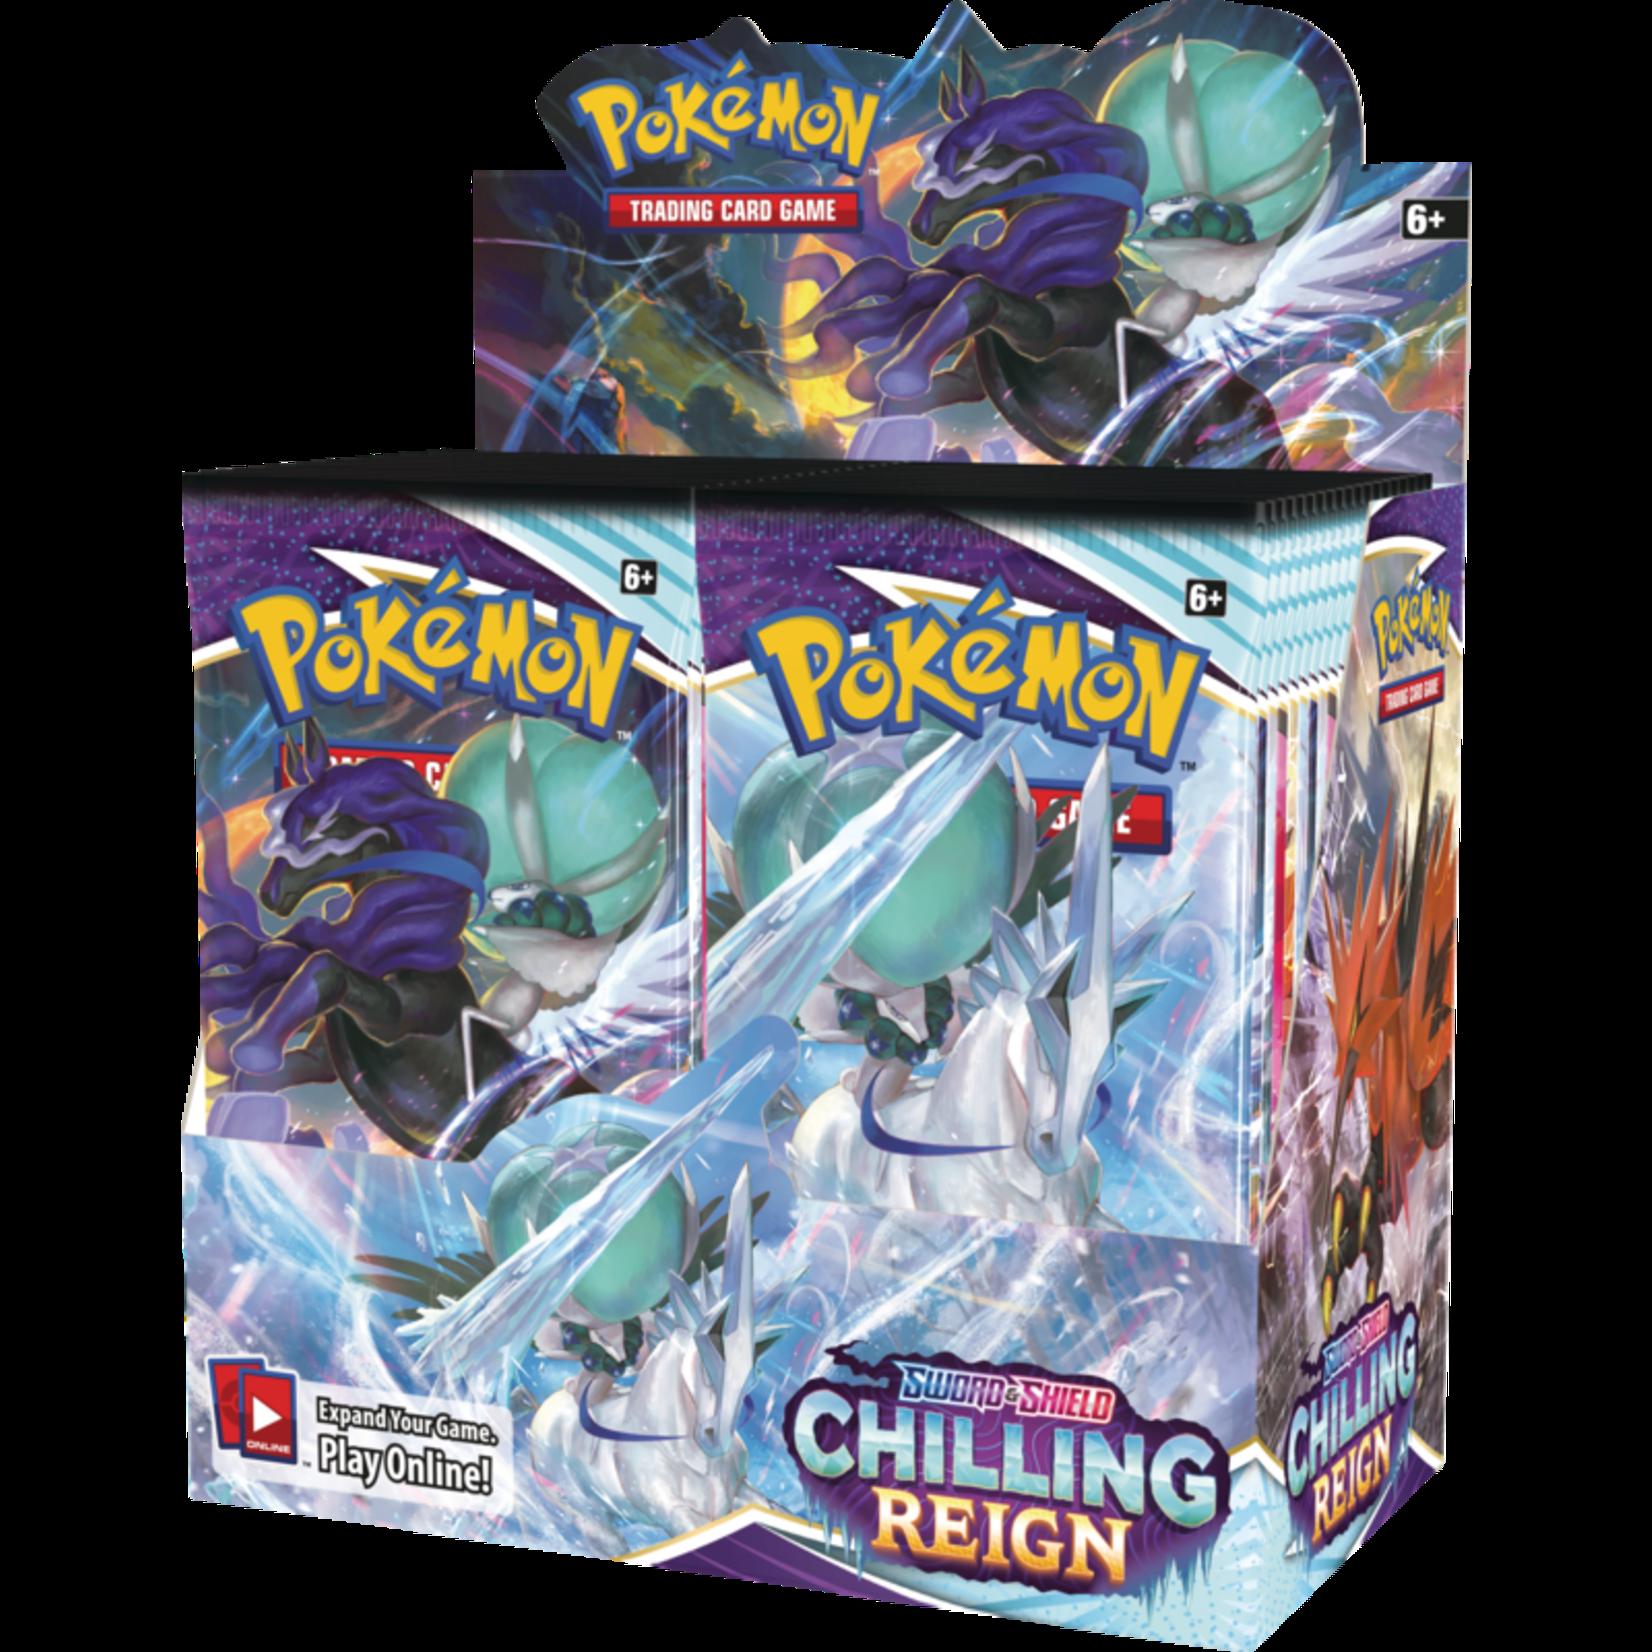 Pokémon Pokémon TCG: Sword & Shield—Chilling Reign Booster Box